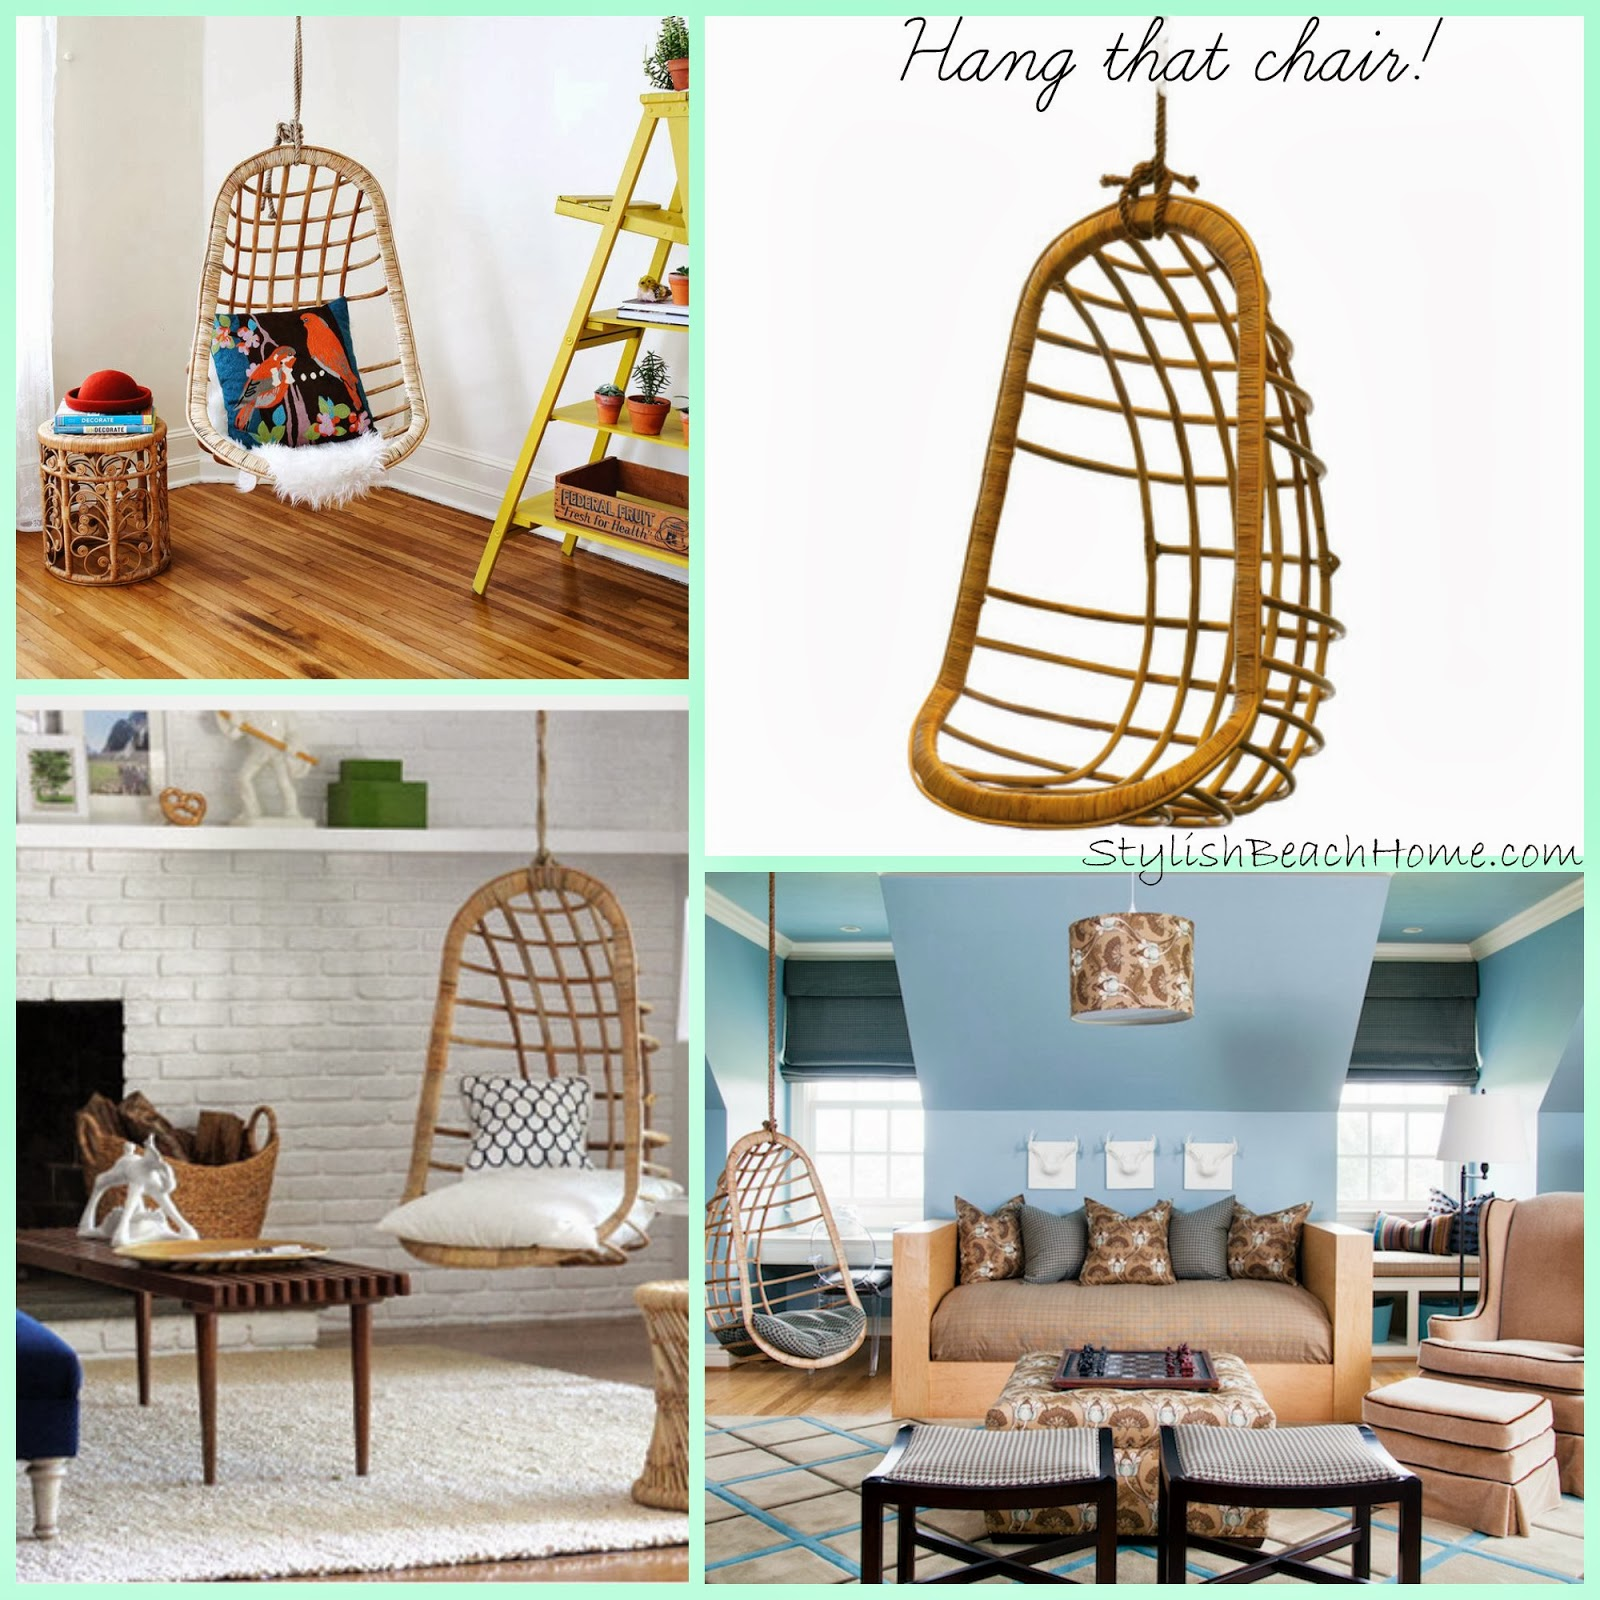 StylishBeachHome.com: Hanging Rattan Chair